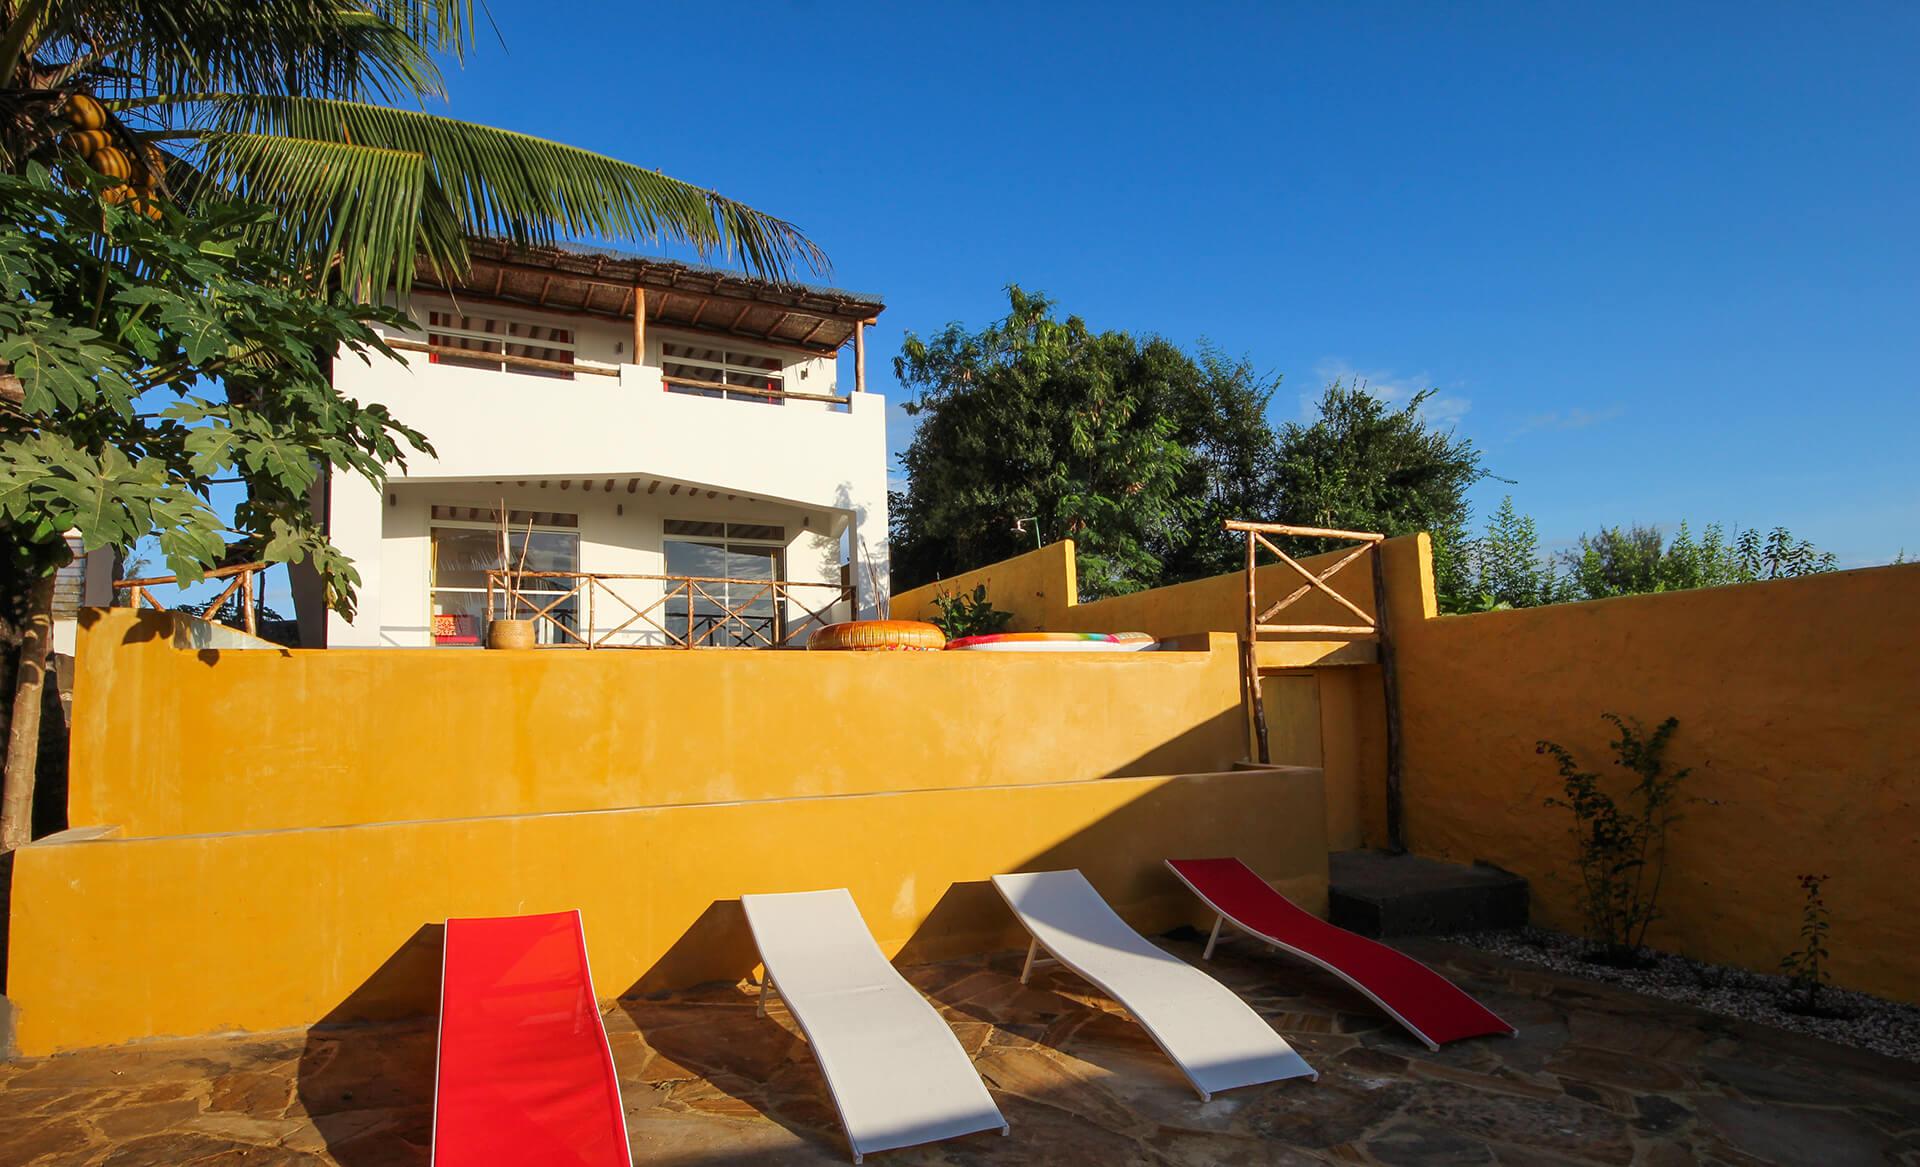 Appartamenti con piscina Maisha pool e view a Kiwengwa Zanzibar